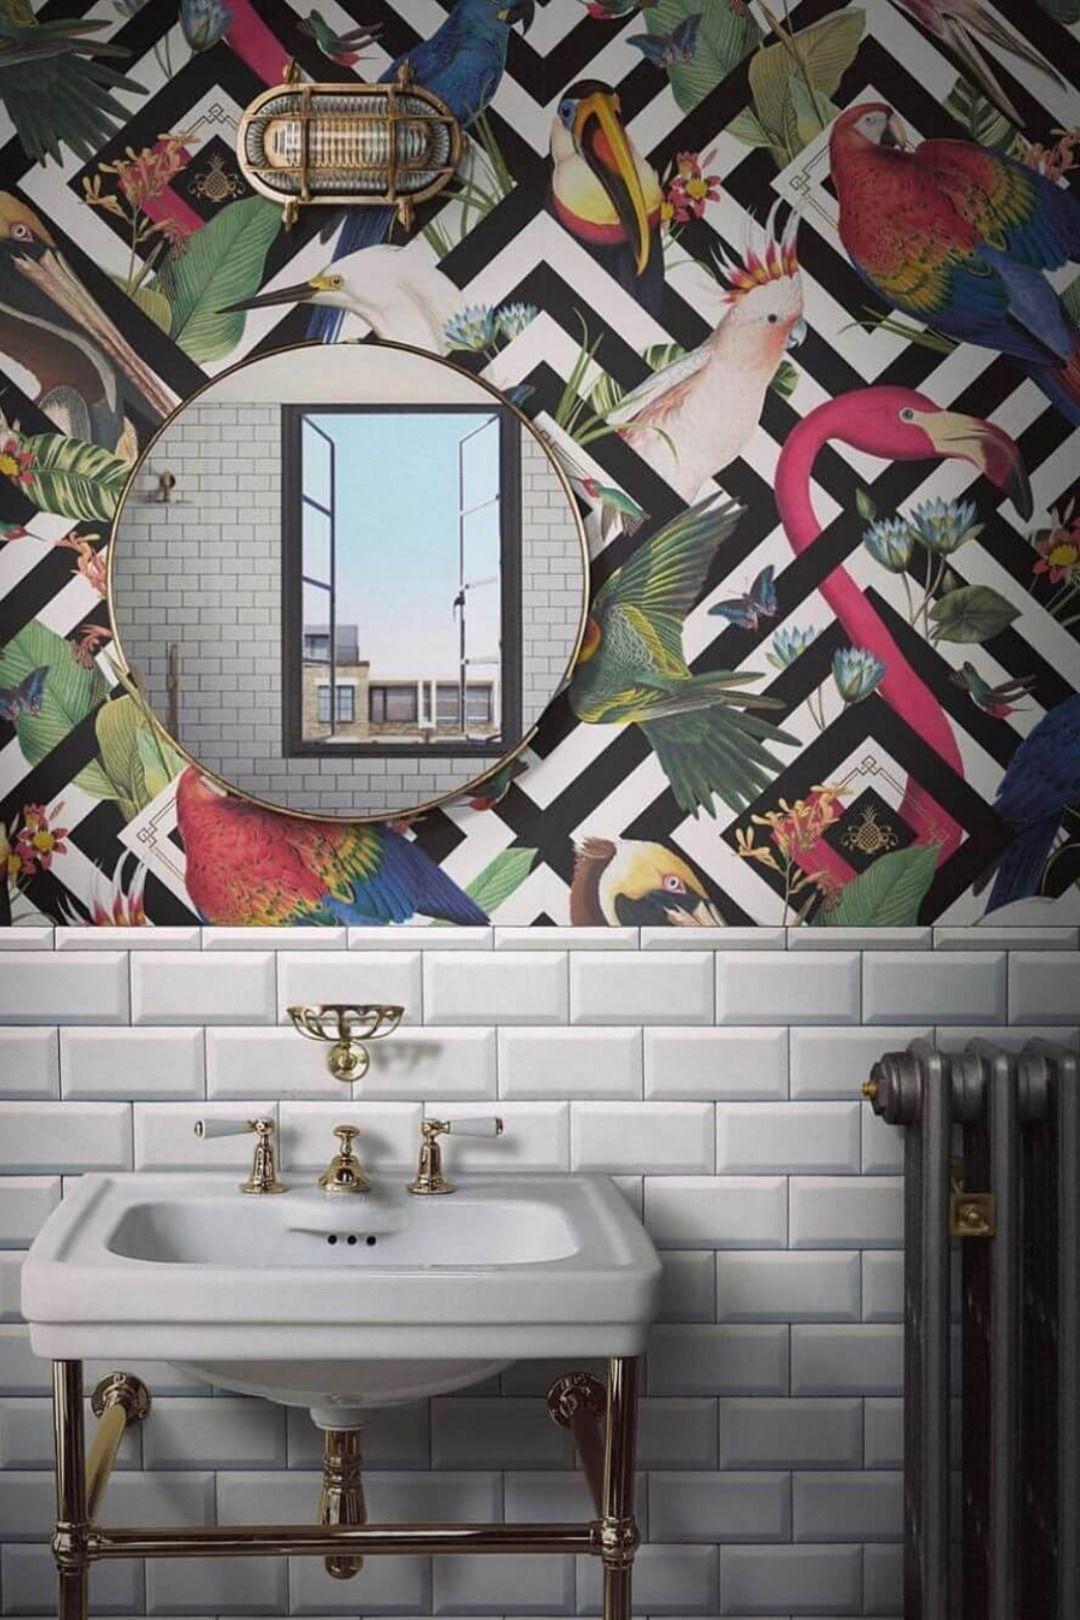 21 Simple Bathroom Wall Decor Ideas Bathroom Wall Decor Remodel Wallpaper Designs For Walls Bathroom Wallpaper Simple Bathroom